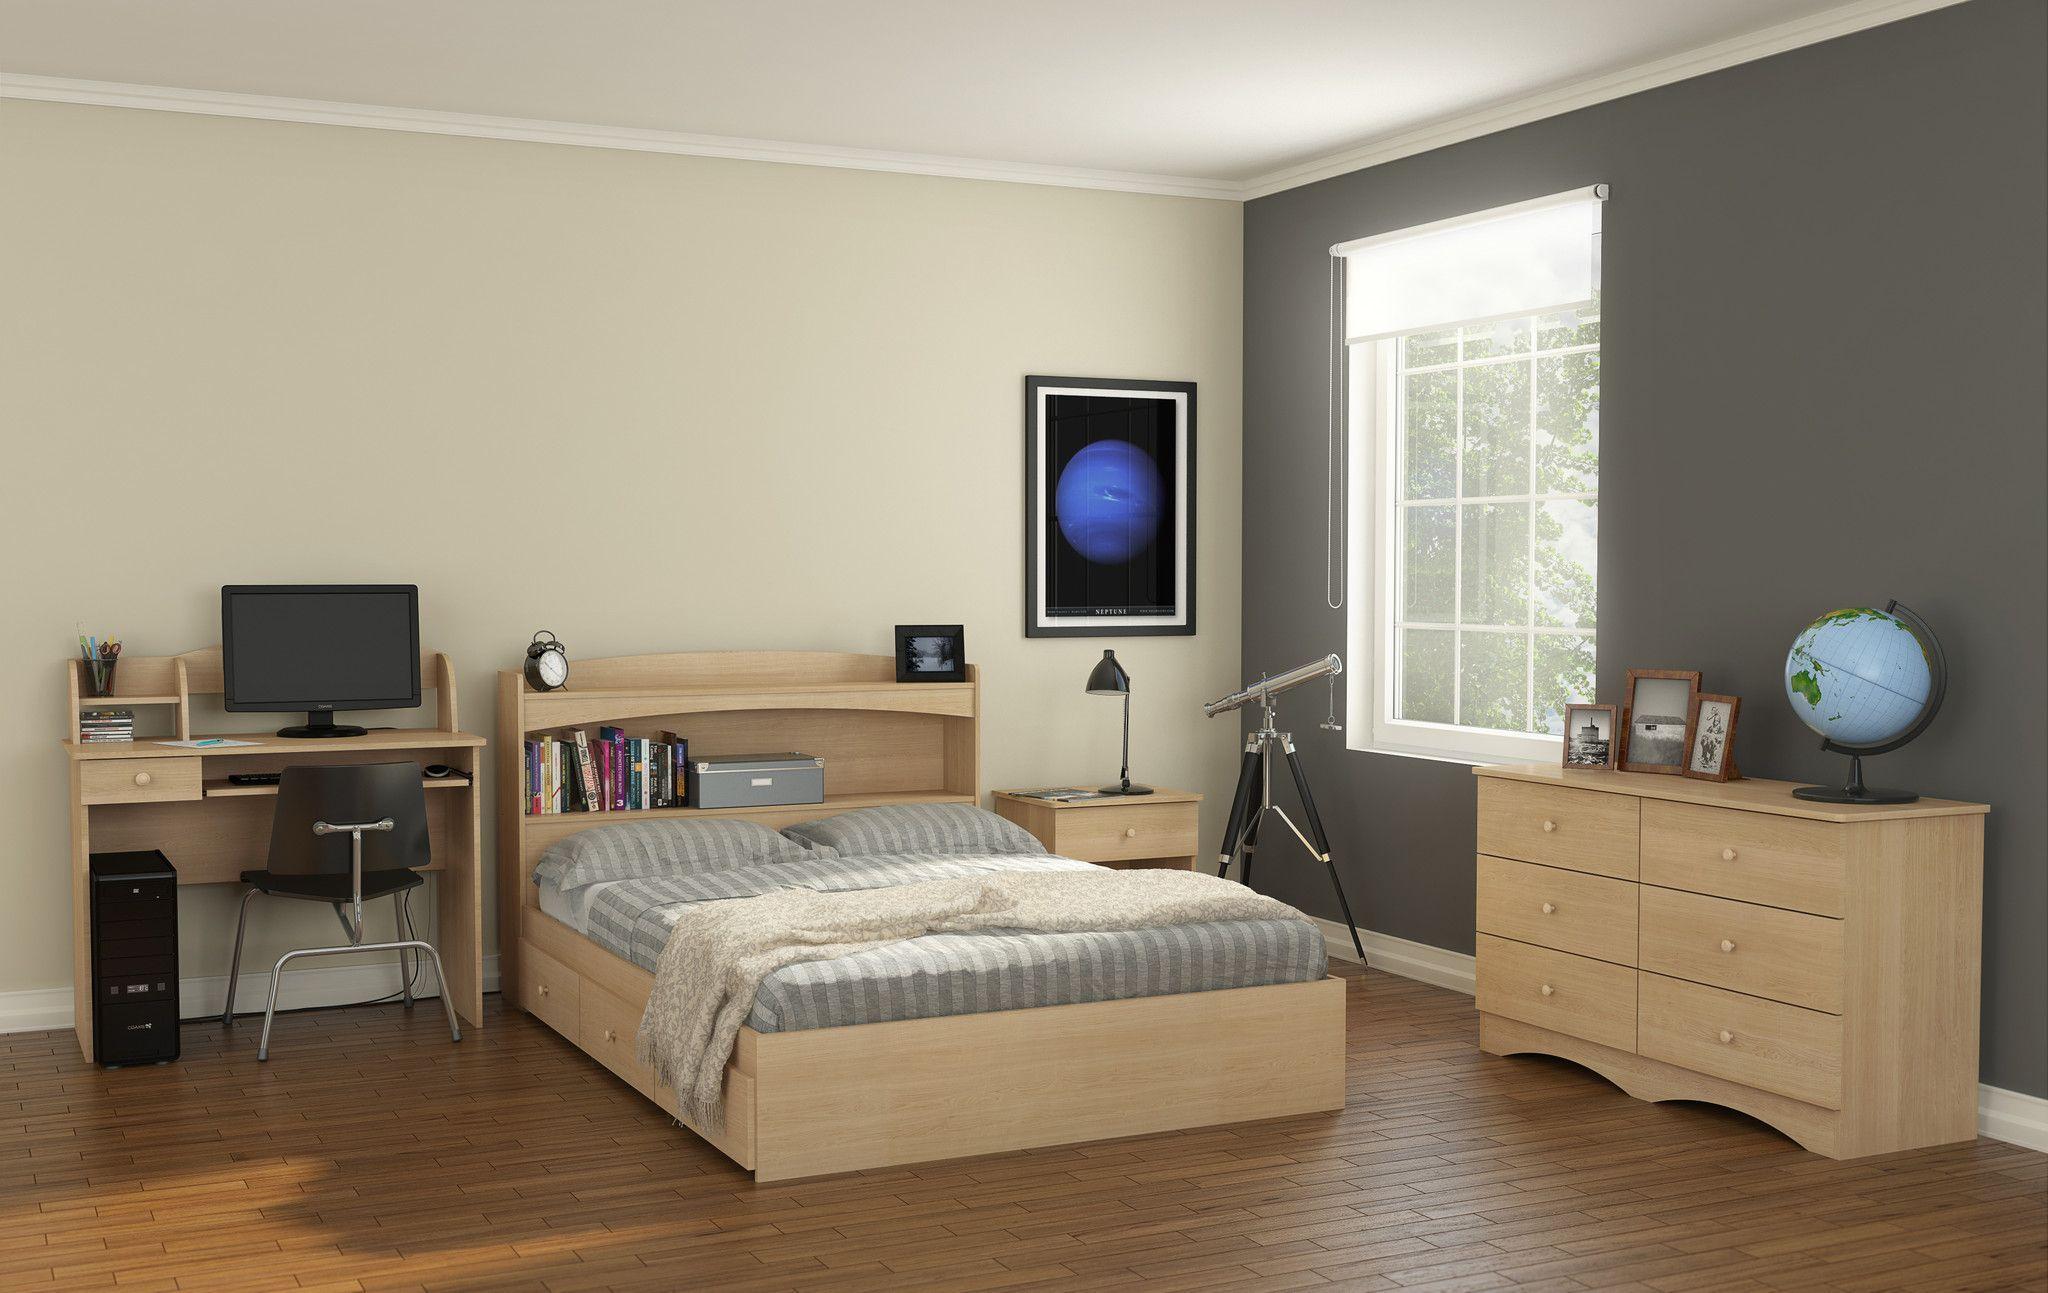 Alegria 5606 6-Drawer Double Dresser from Nexera, Natural Maple